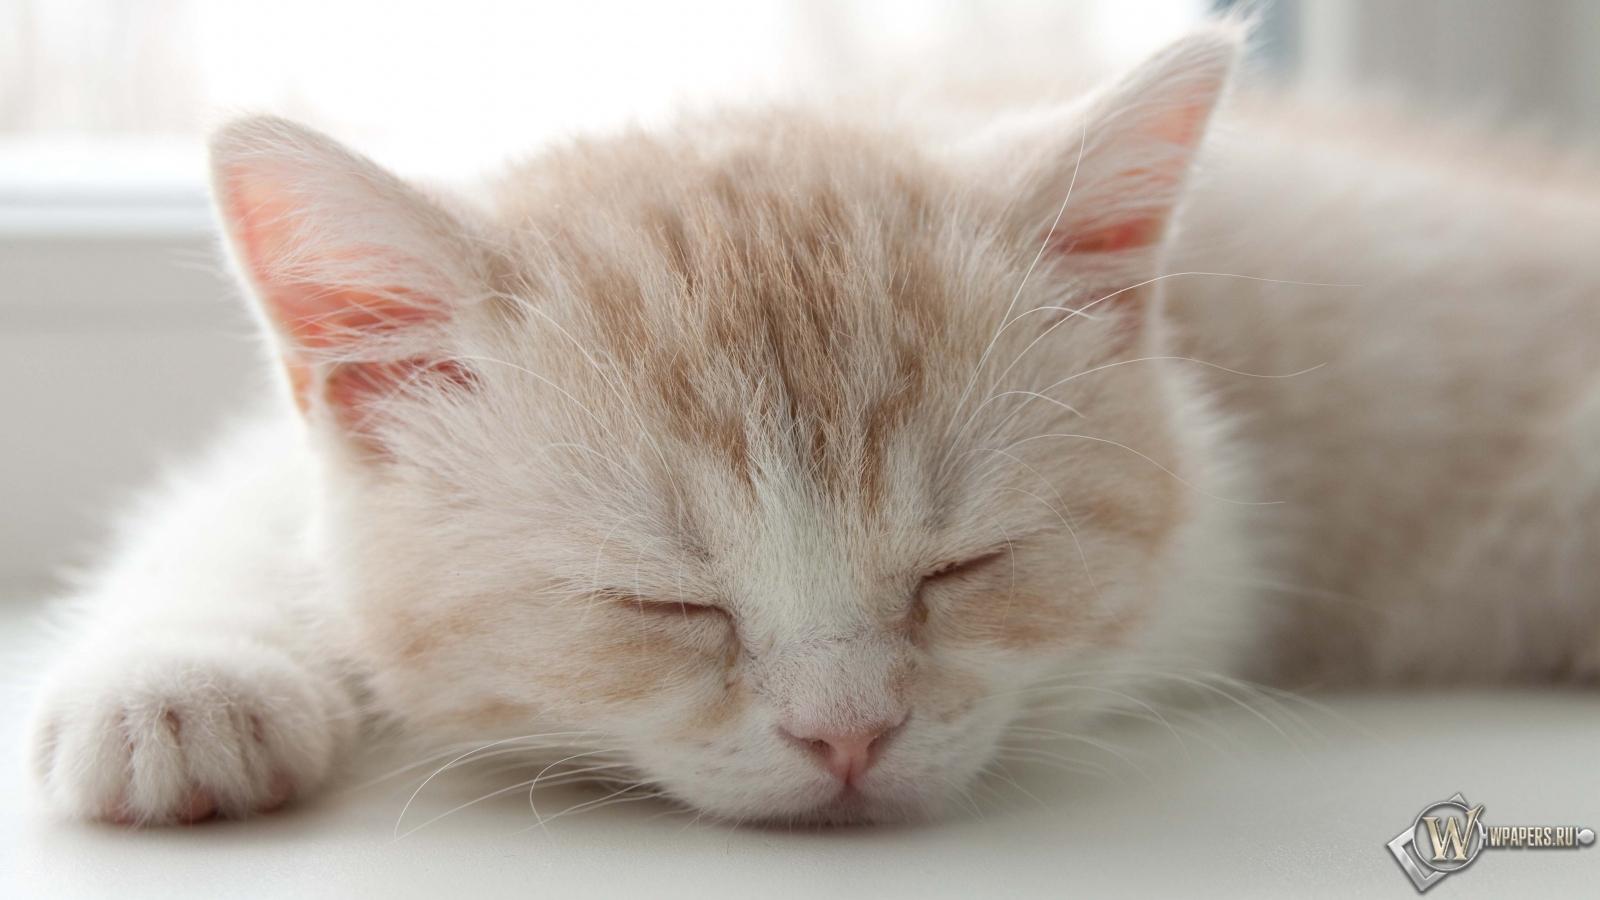 Котёнок спит 1600x900